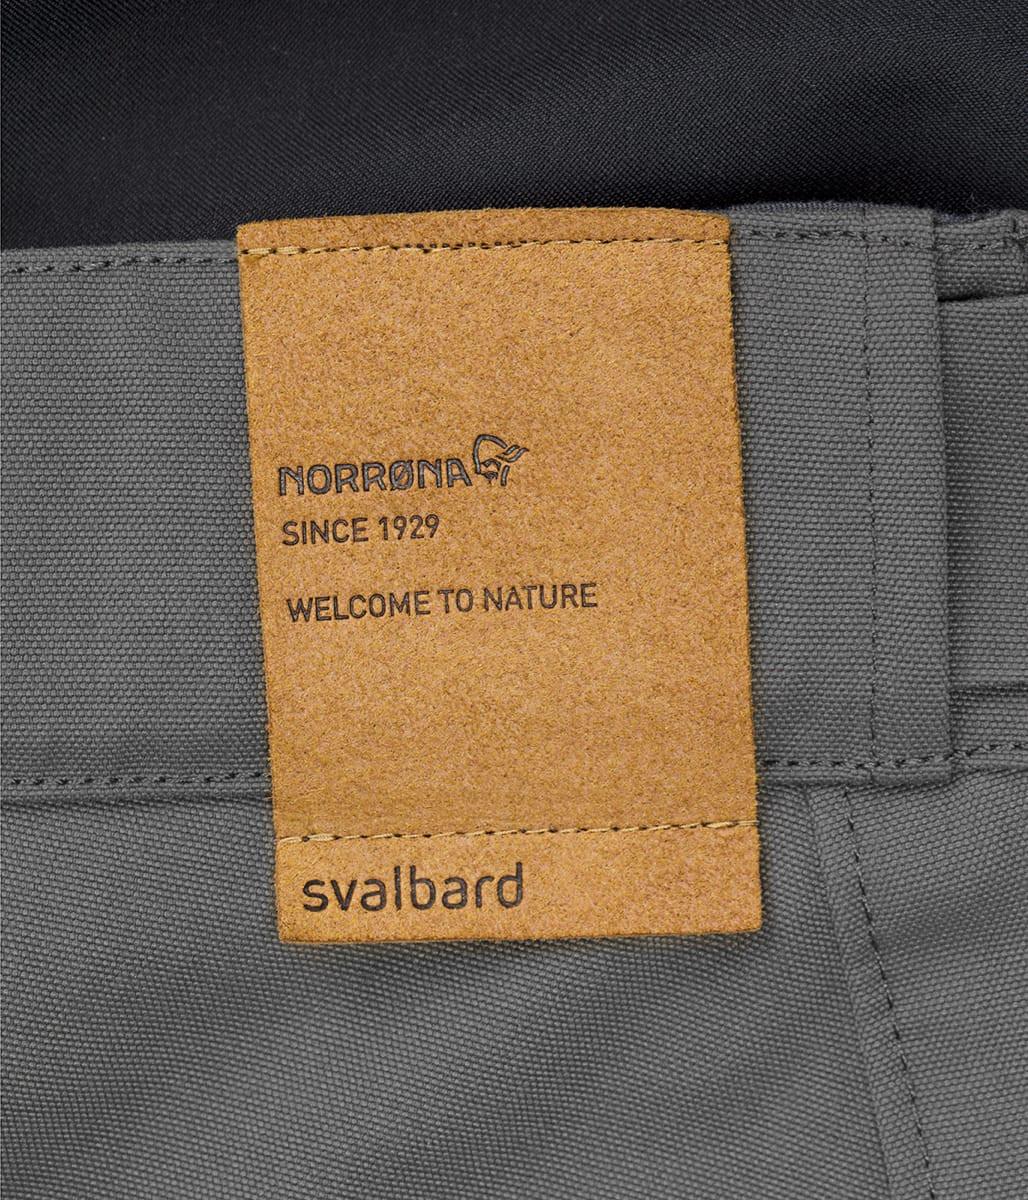 ad2f02f1 Norrøna Svalbard Heavy Duty Pants (M) Slate Grey   Fjellsport.no